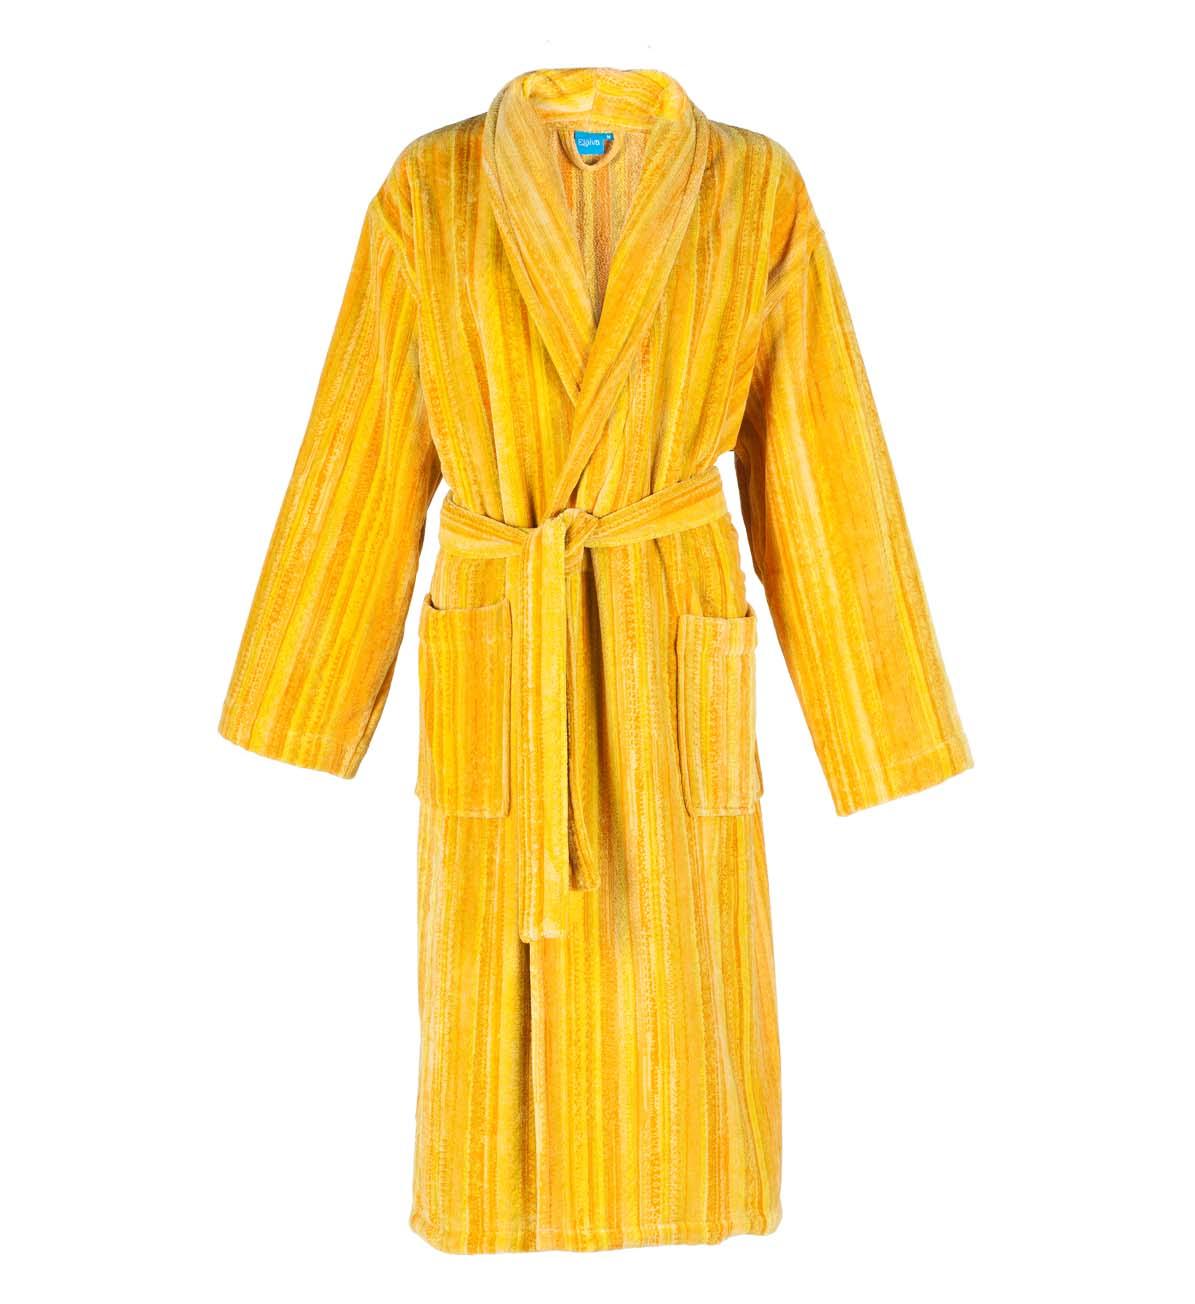 Yellow Shadows Collar Bath Robe (S)